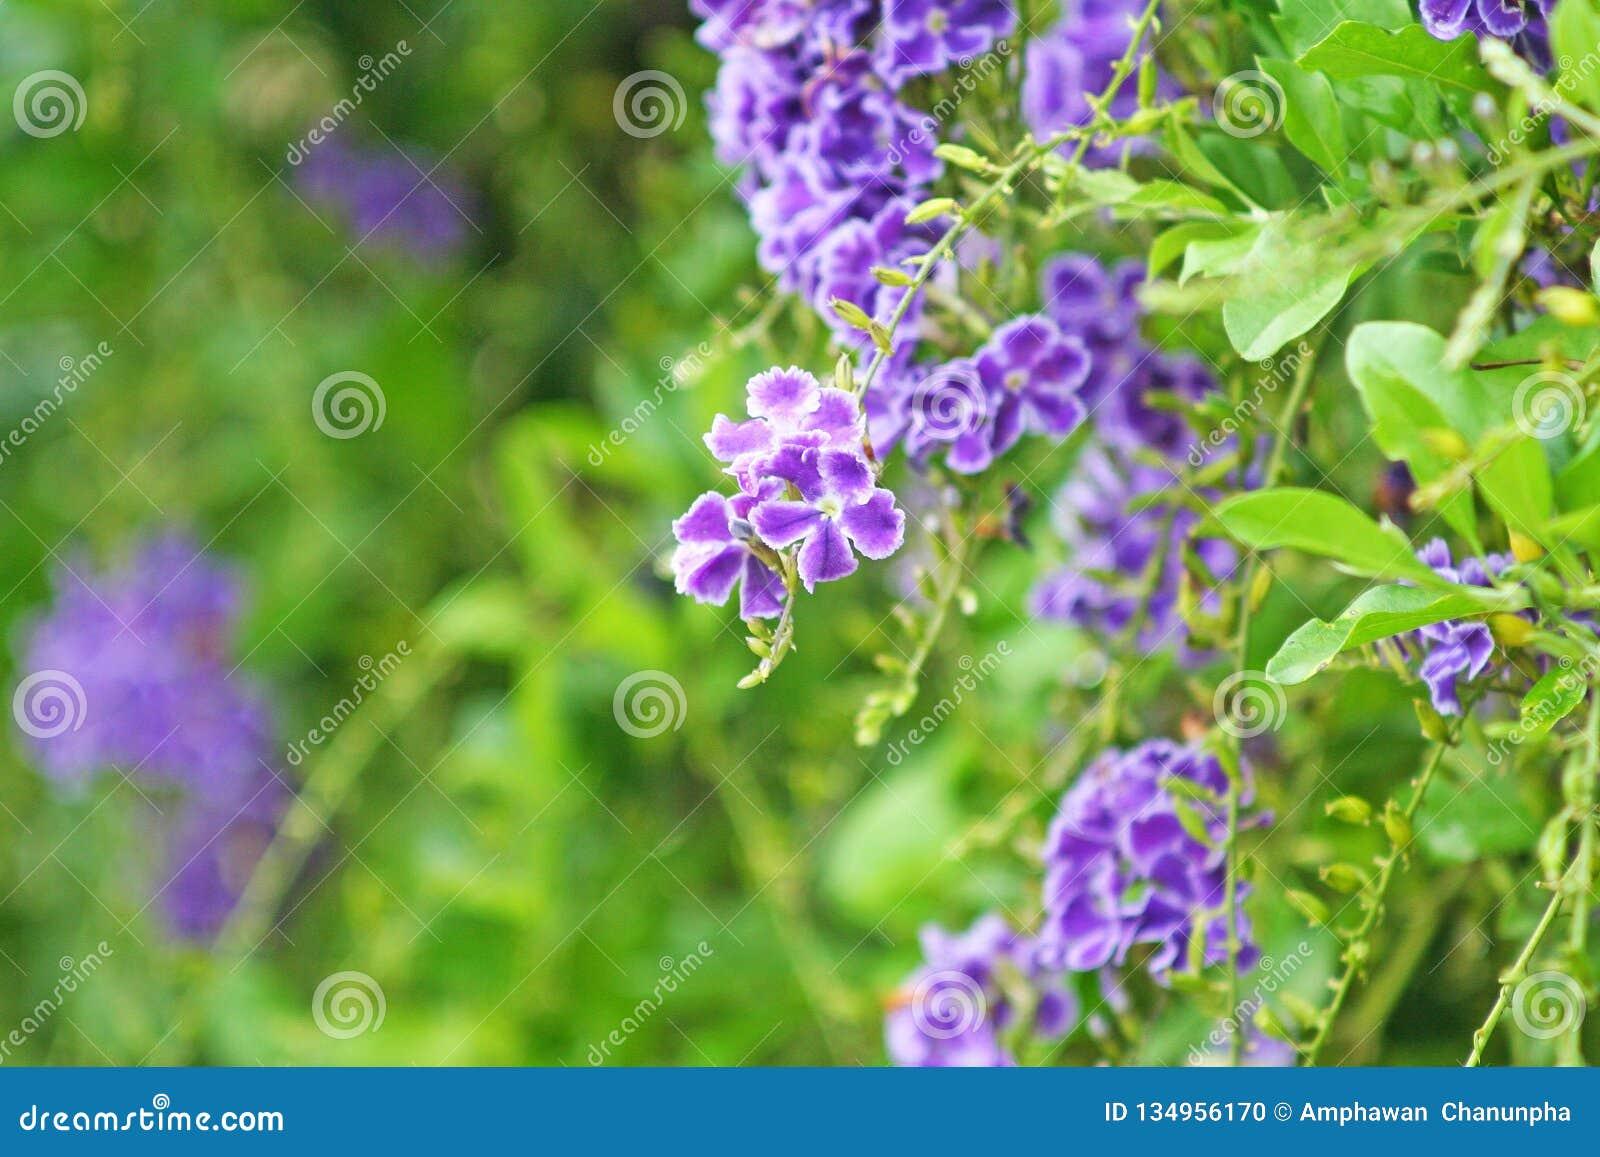 Duranta erecta fence tree,Purple flower blooming Sky flower